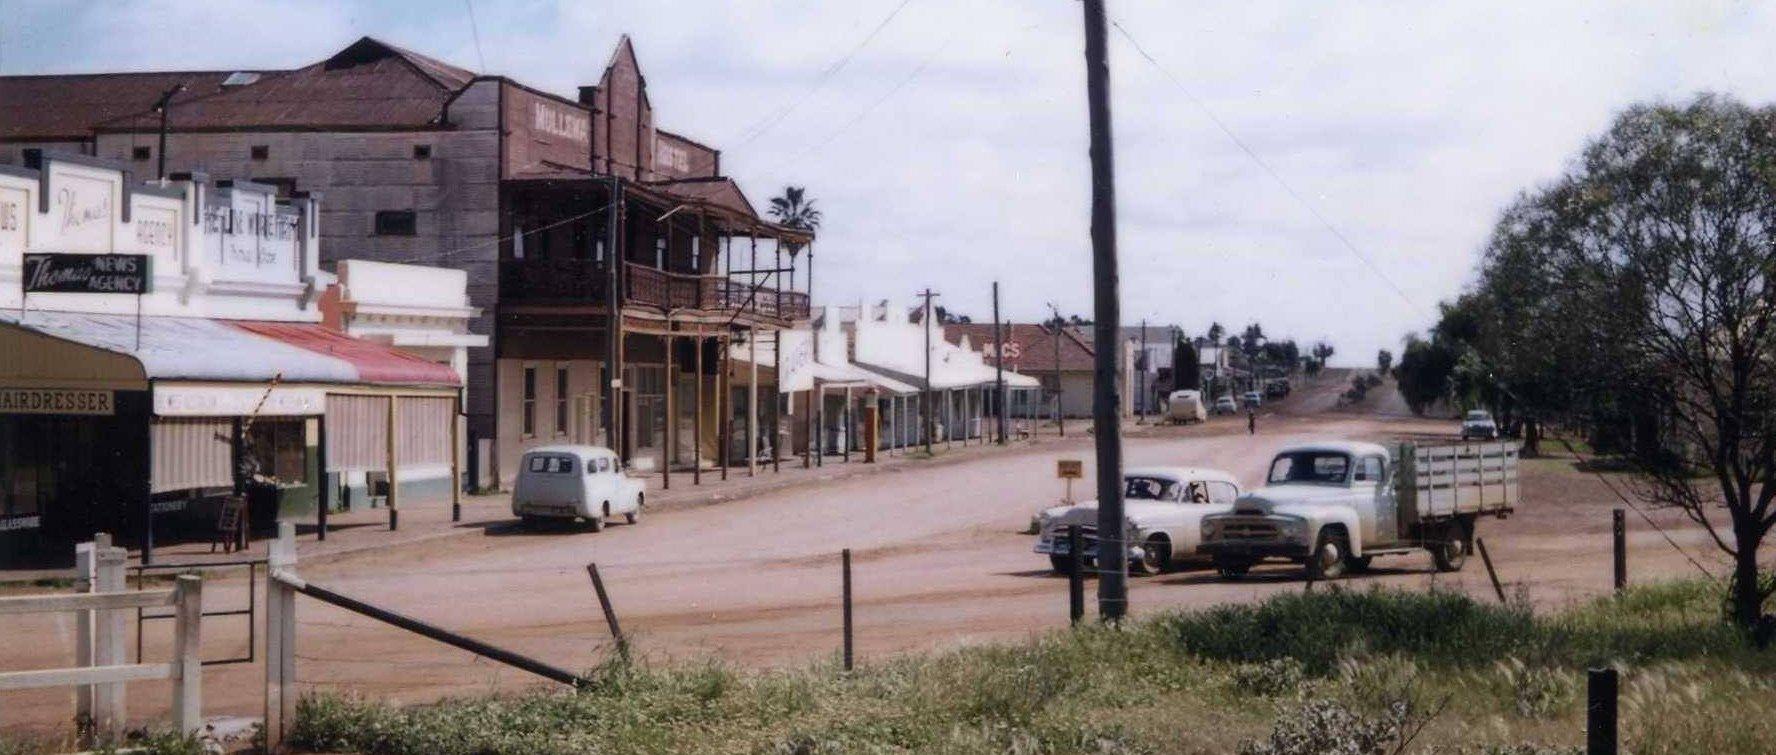 Jose Street Mullewa 1957